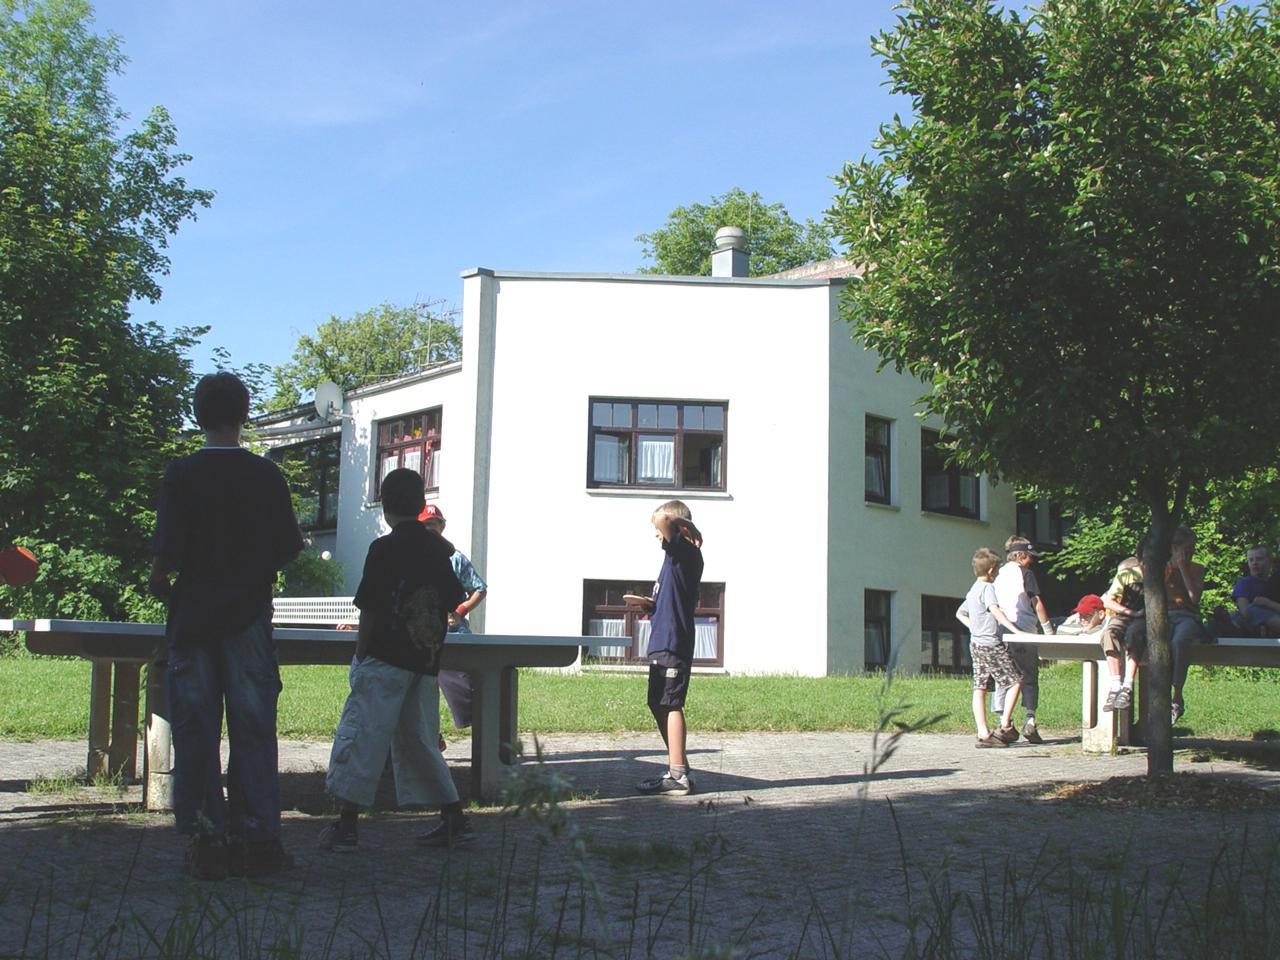 Jugendherberge-Mühlhausen.jpg